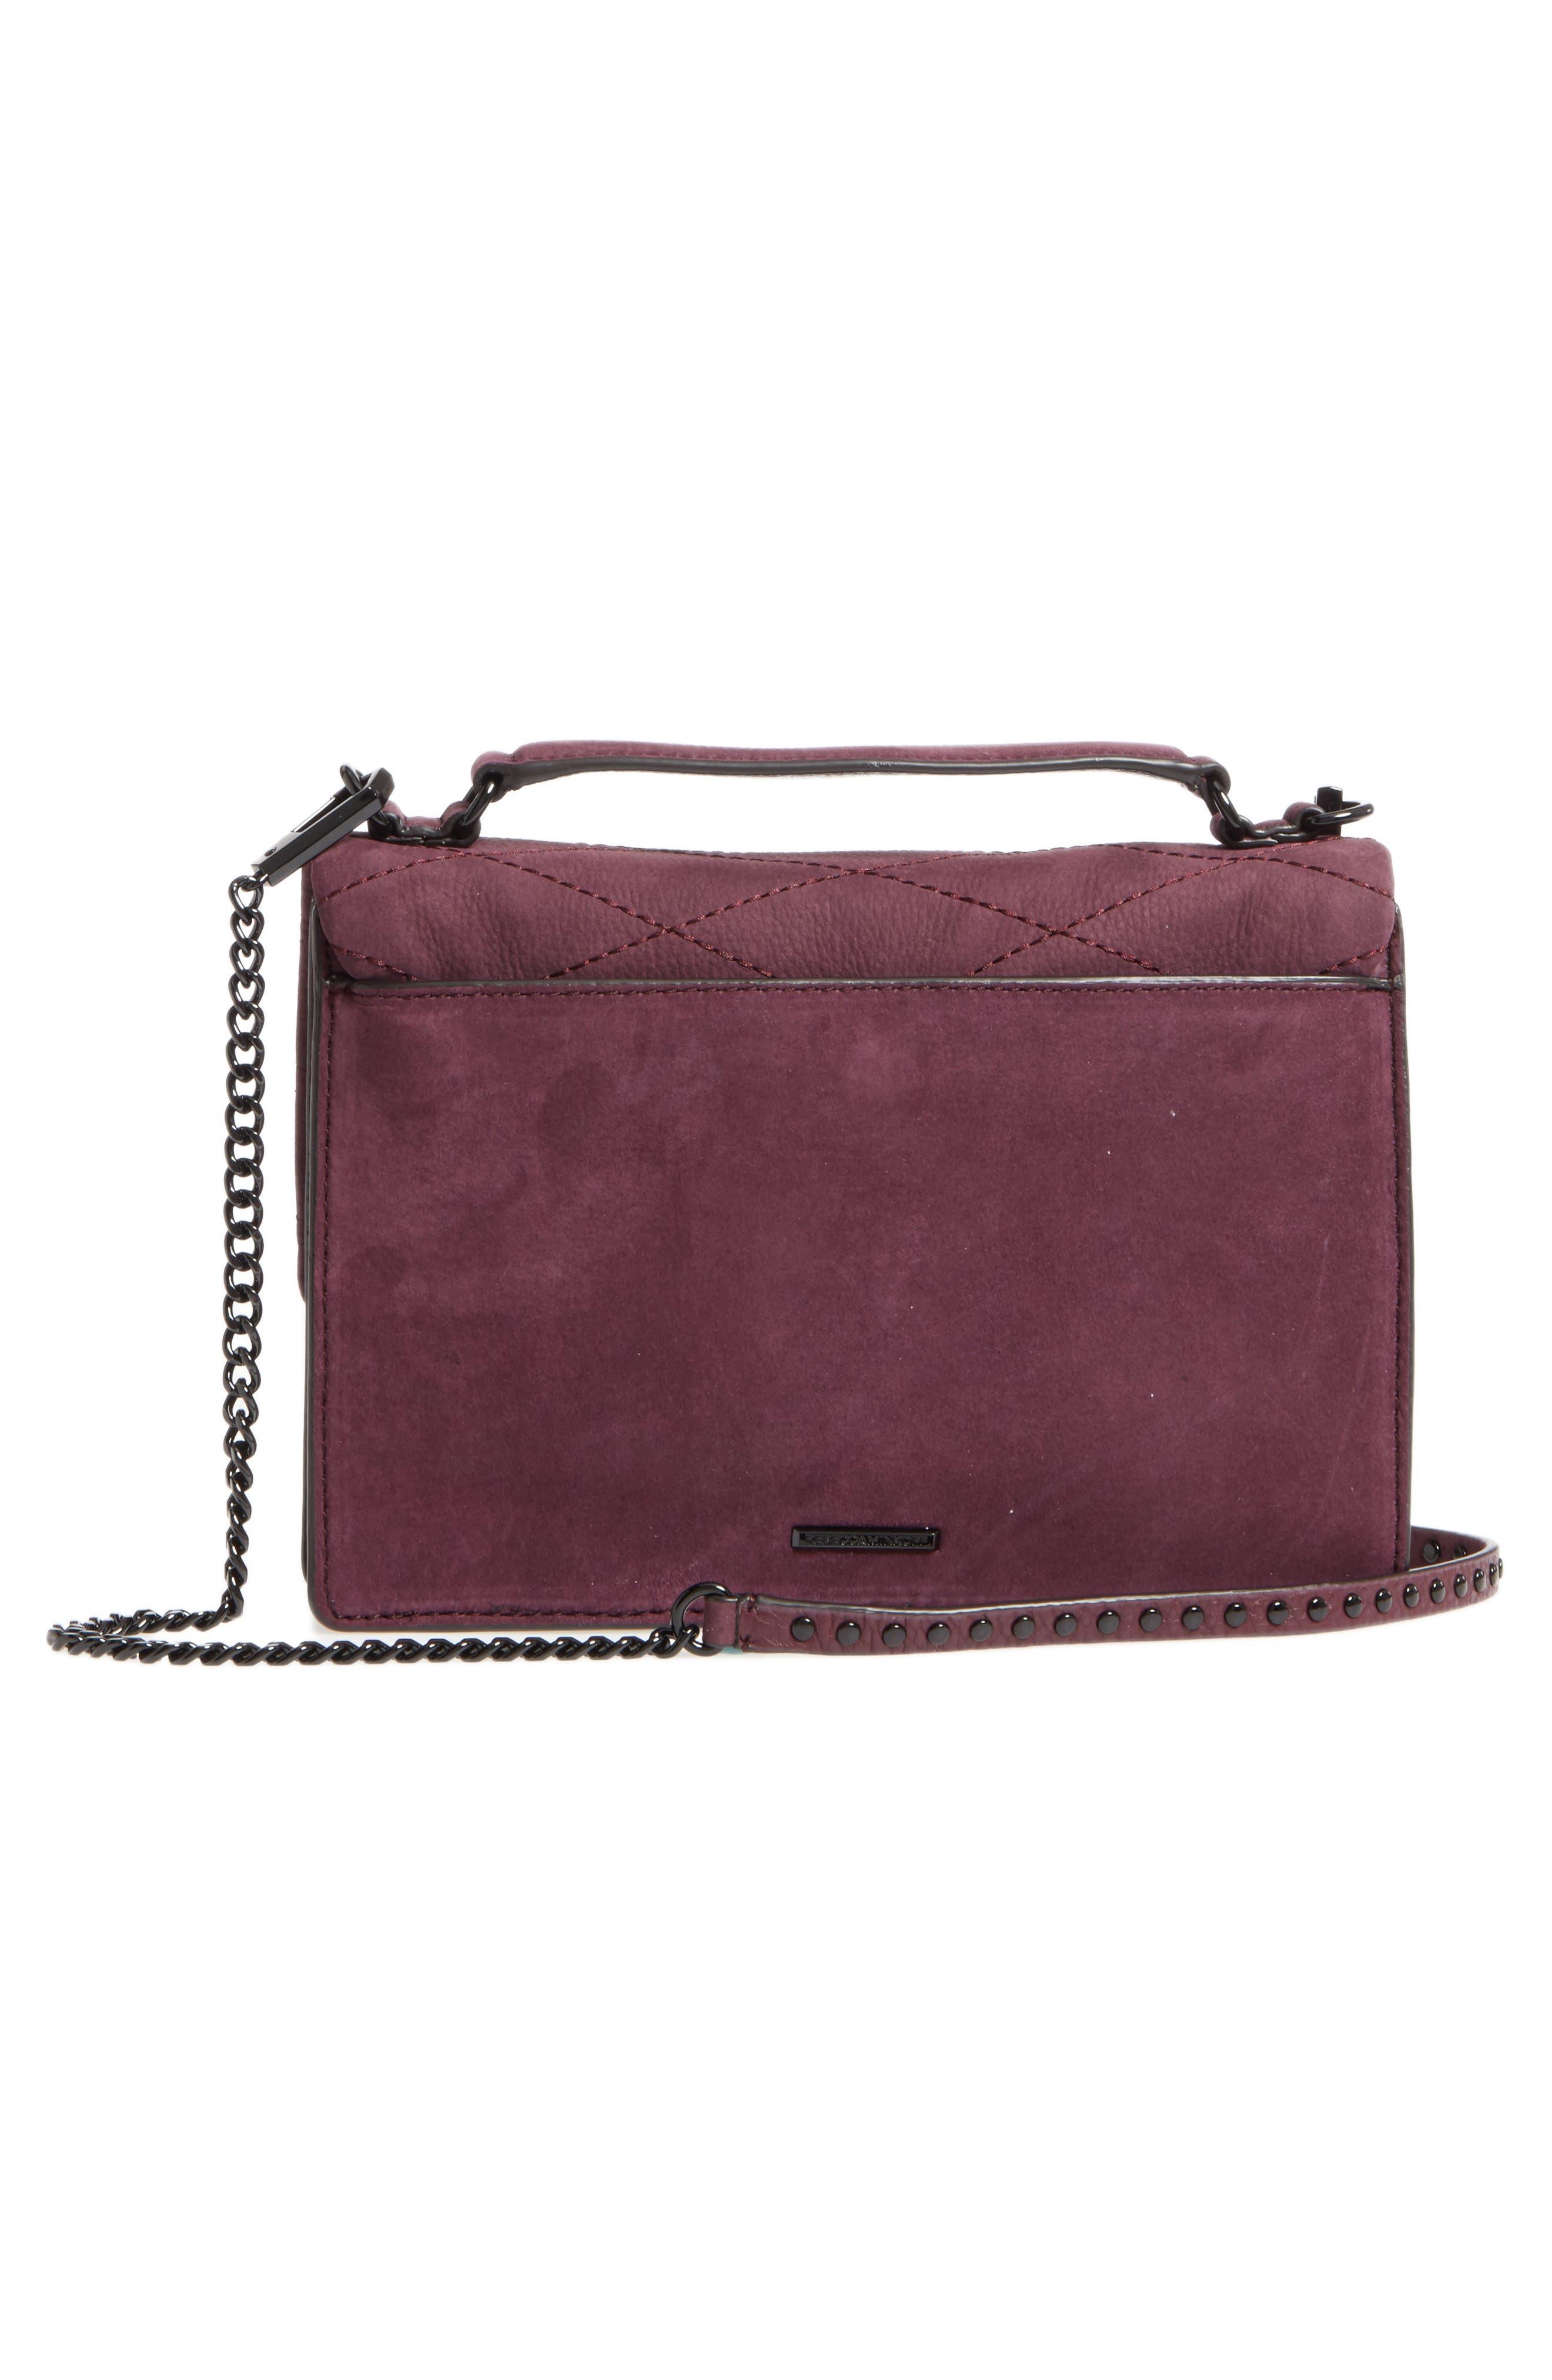 Medium Je T'aime Convertible Leather Crossbody Bag,                             Alternate thumbnail 26, color,